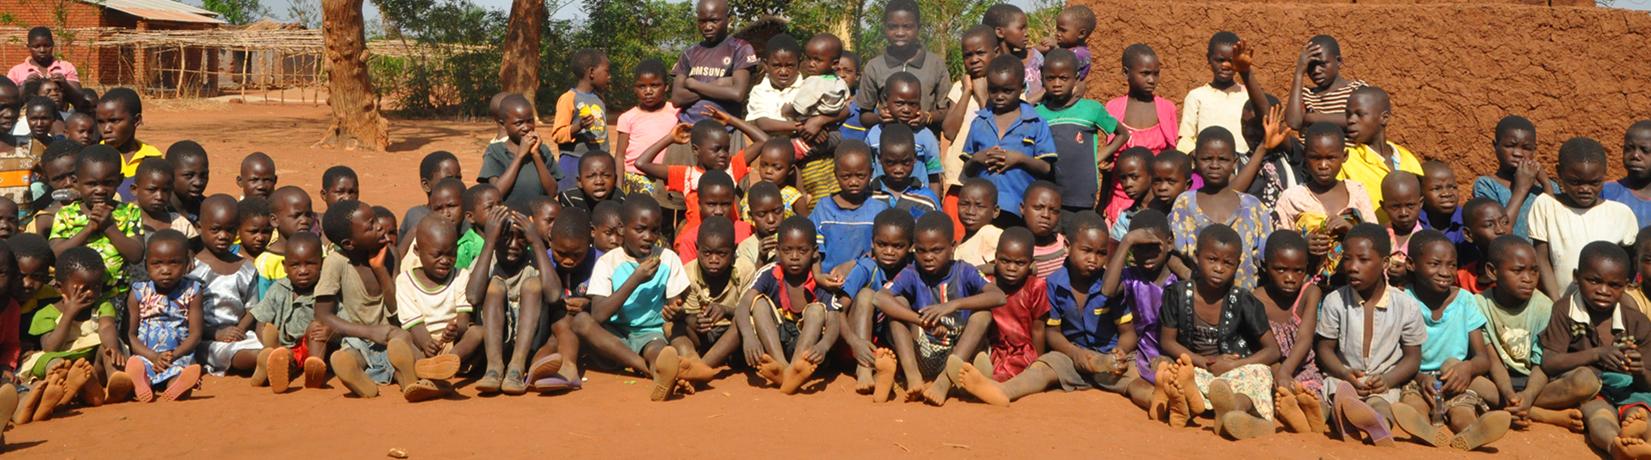 Kidshare gaat naar Malawi